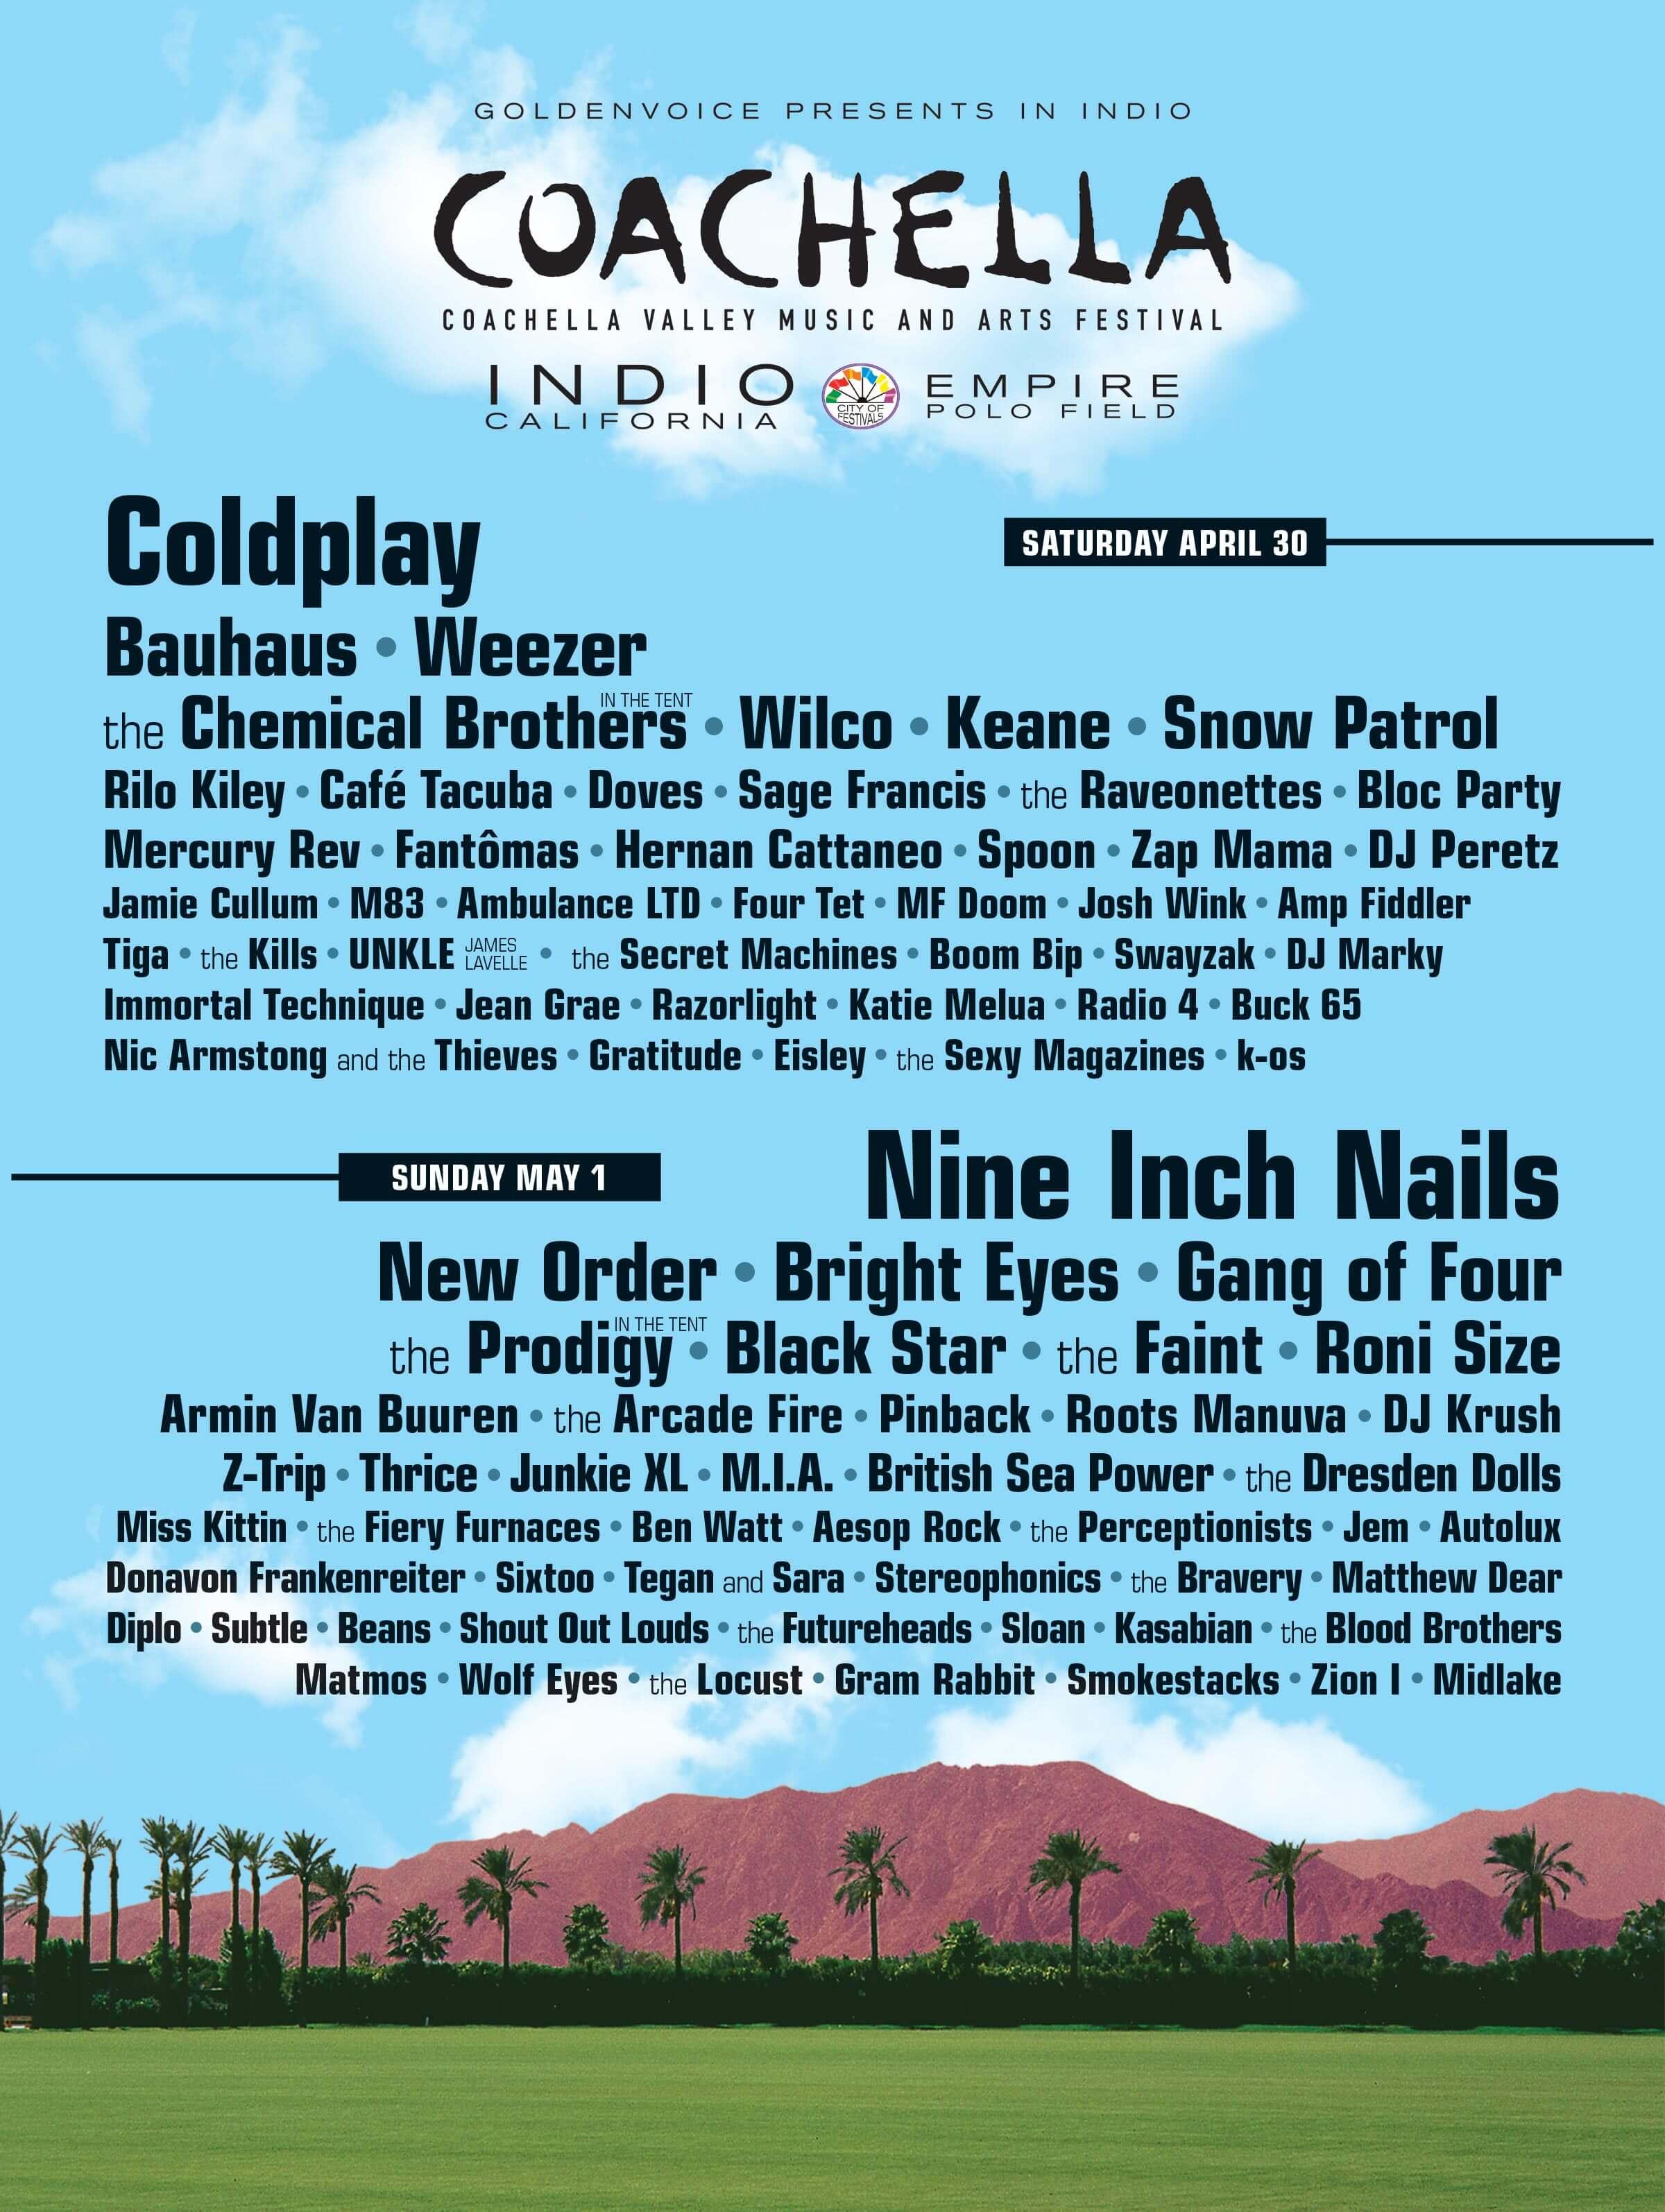 Coachella 2005 Lineup Poster